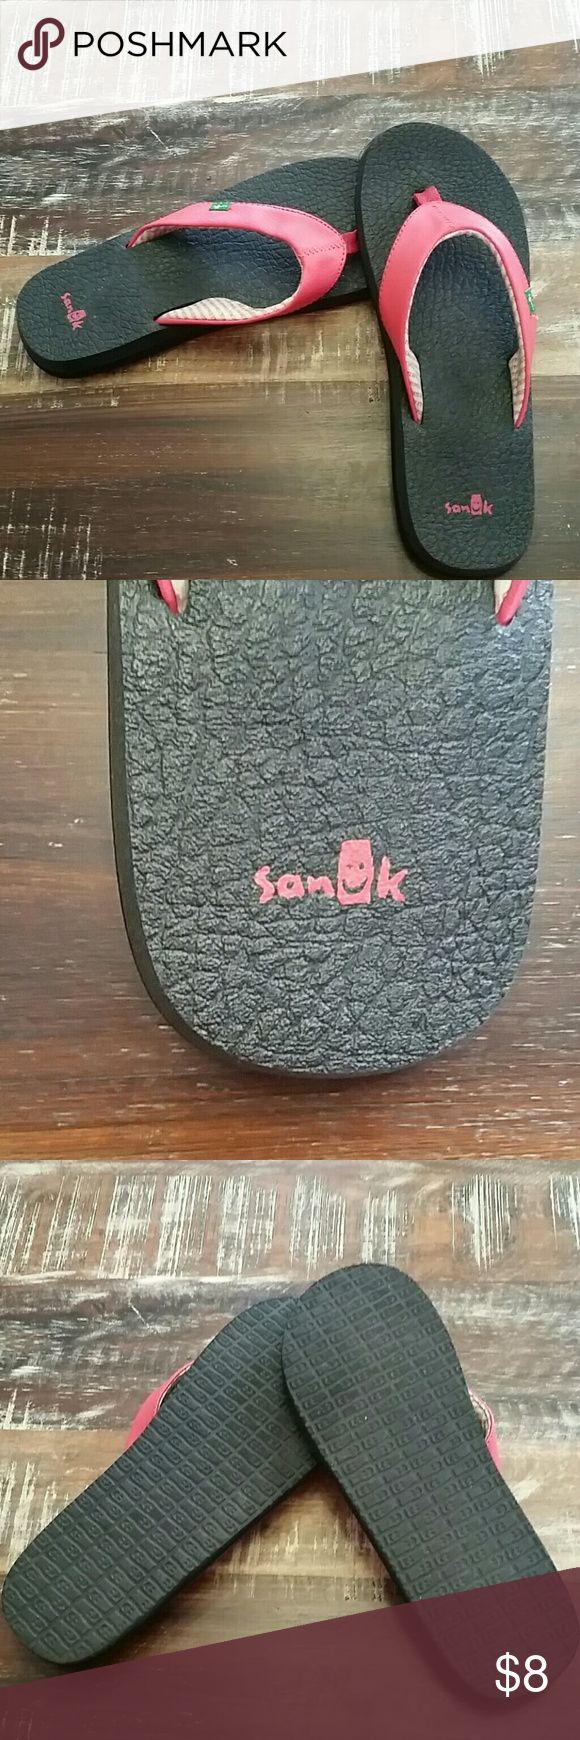 Sanuk flip flops, never worn! Sanuk flip flops never worn.  Yoga mat soles for extra comfort! Sanuk Shoes Sandals